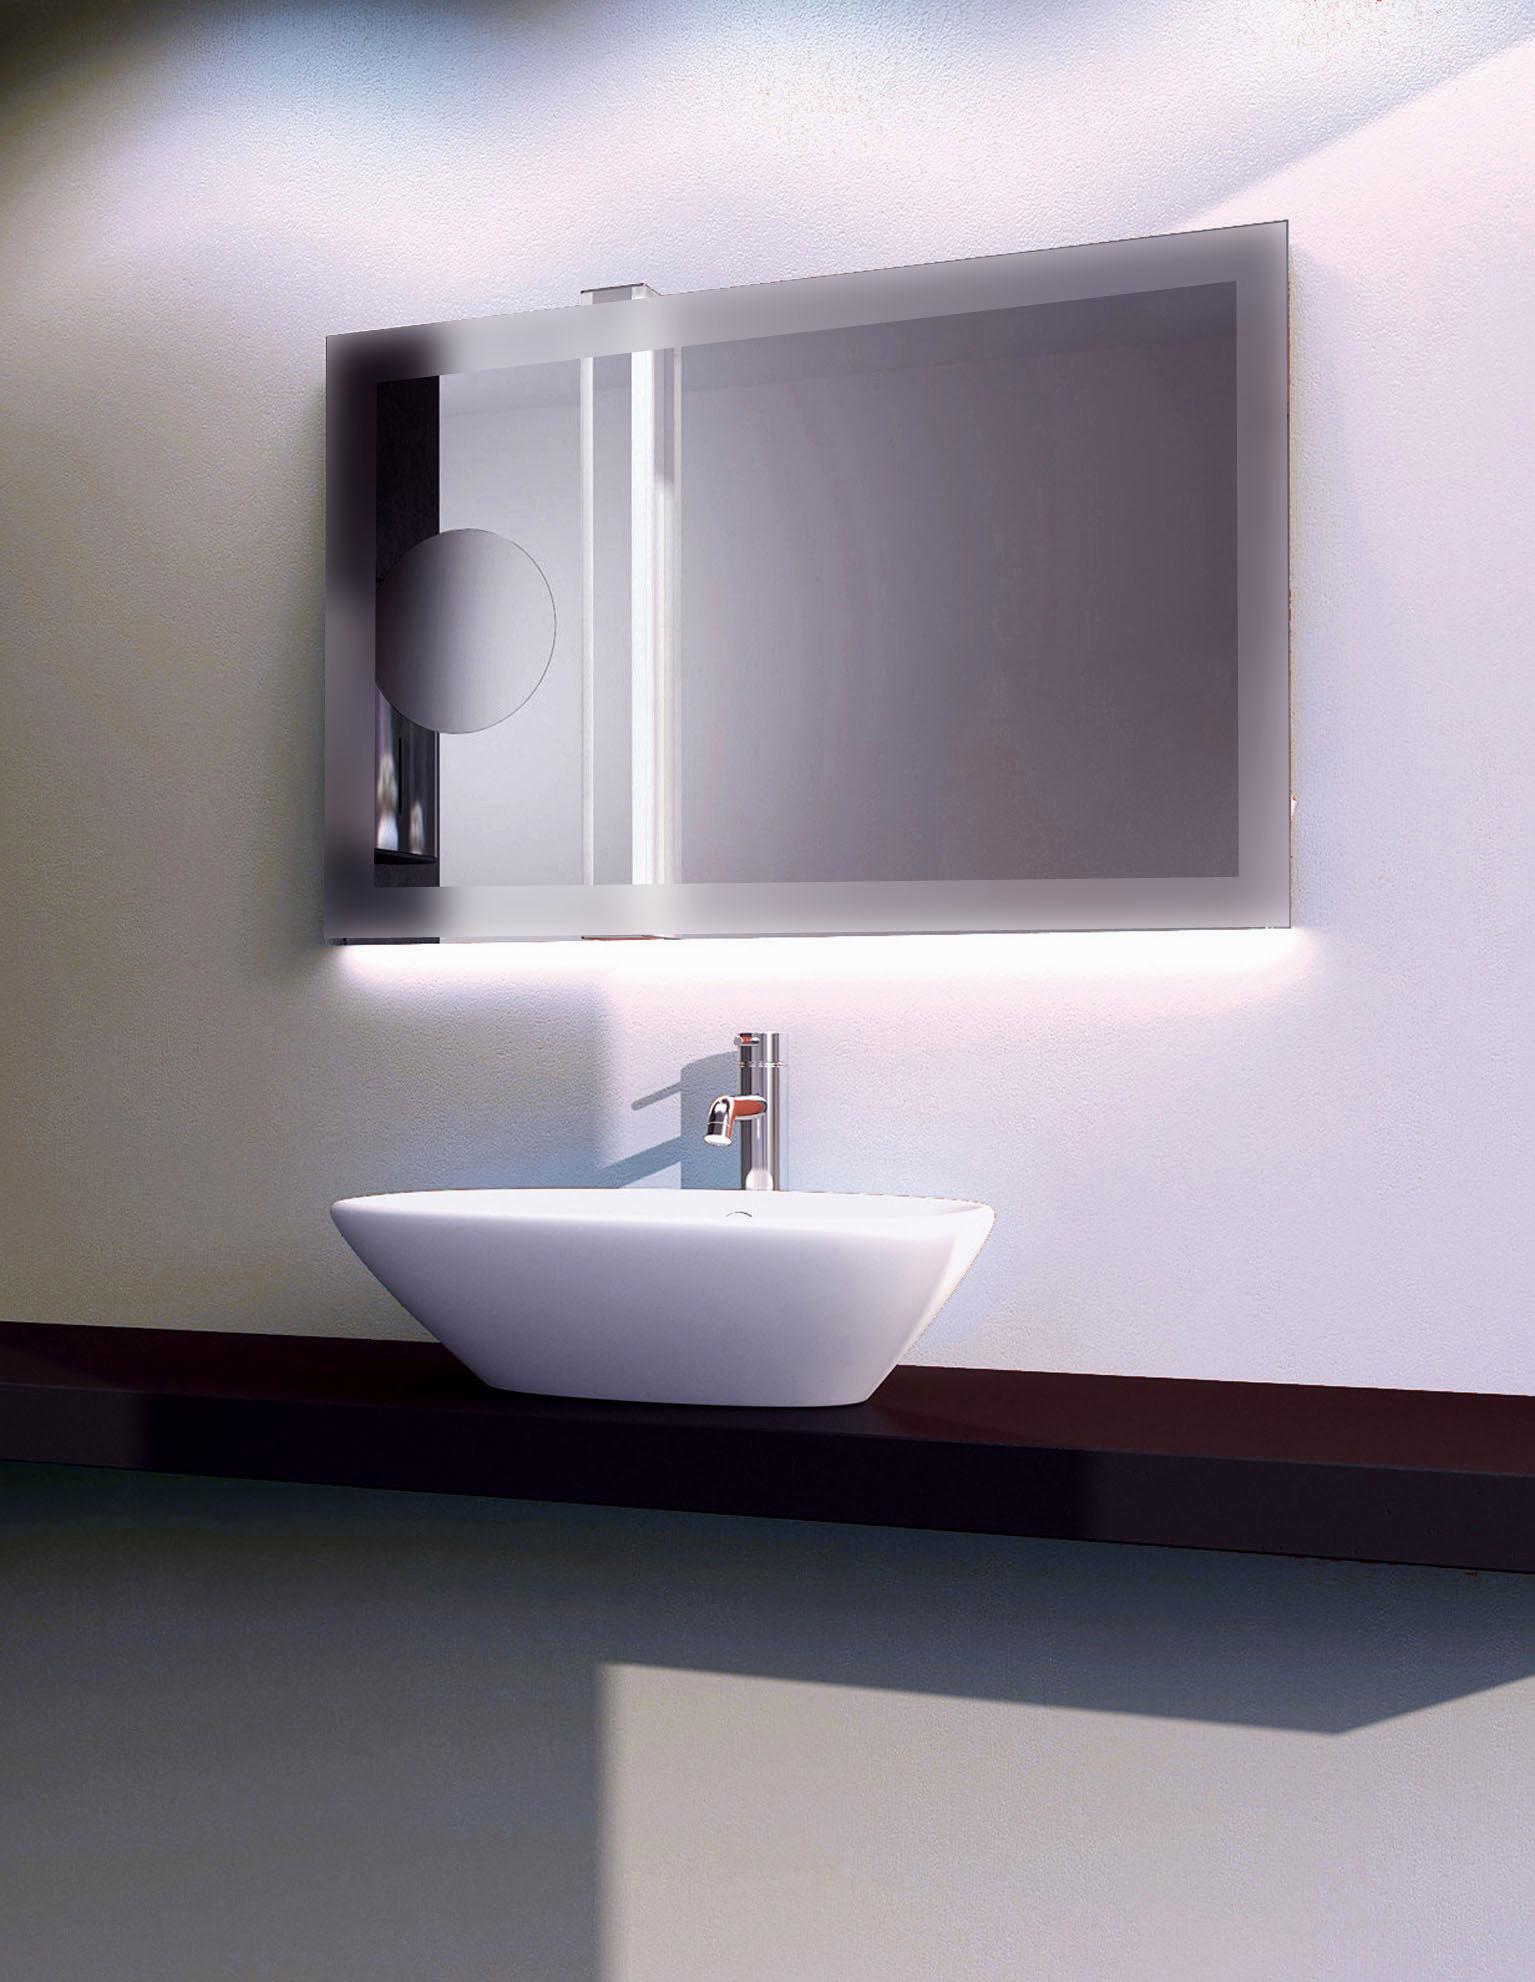 new framed bathroom mirrors inspiration-Stylish Framed Bathroom Mirrors Picture